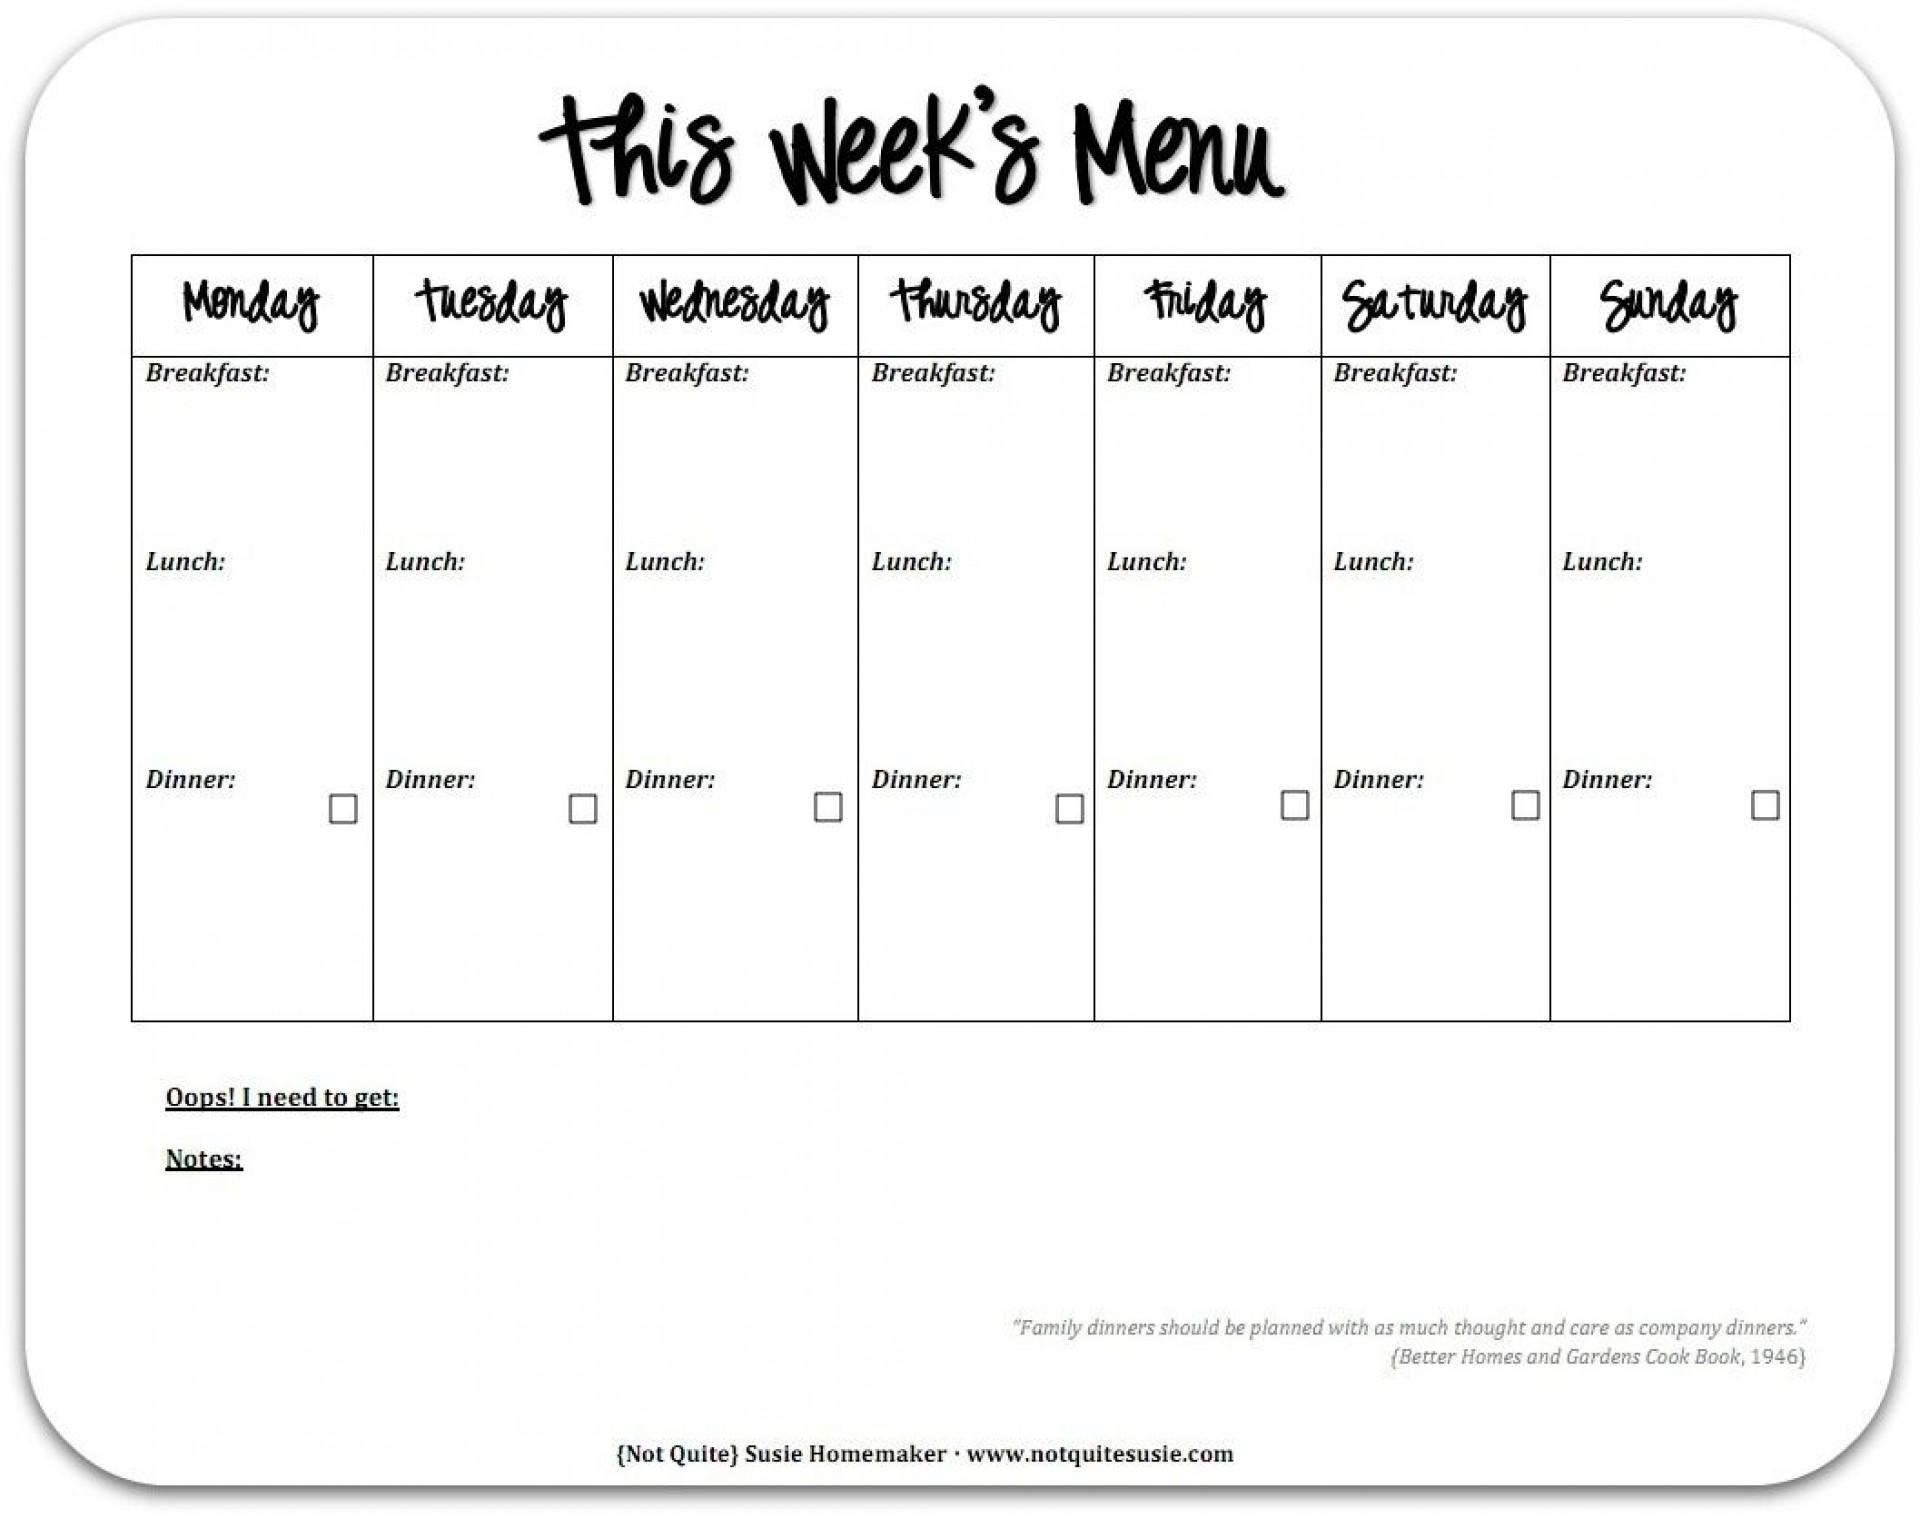 004 Top Weekly Eating Plan Template Example  Food Planner Excel Meal Download1920